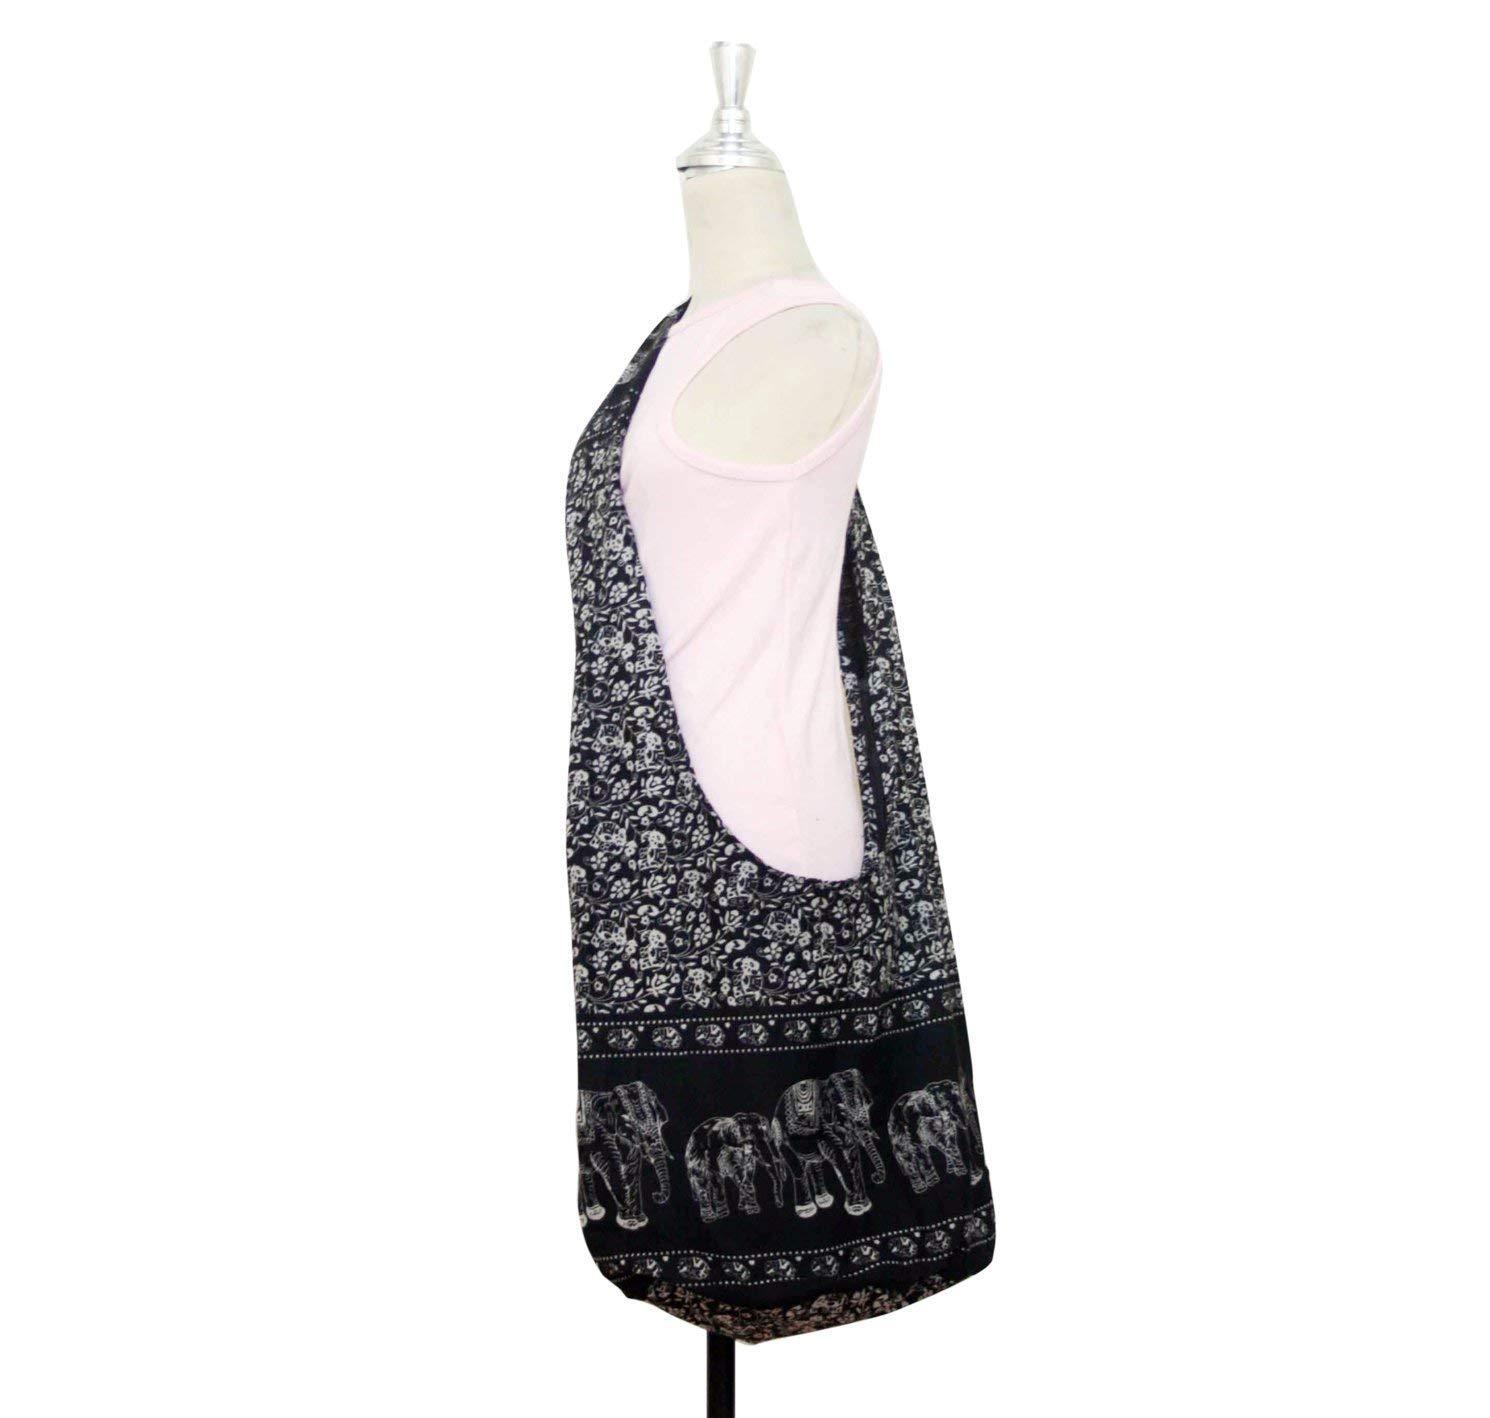 Hippie Elephant Sling Crossbody Bag Purse Thai Top Zip Handmade Black S11 by Thai Hippie Bag (Image #1)